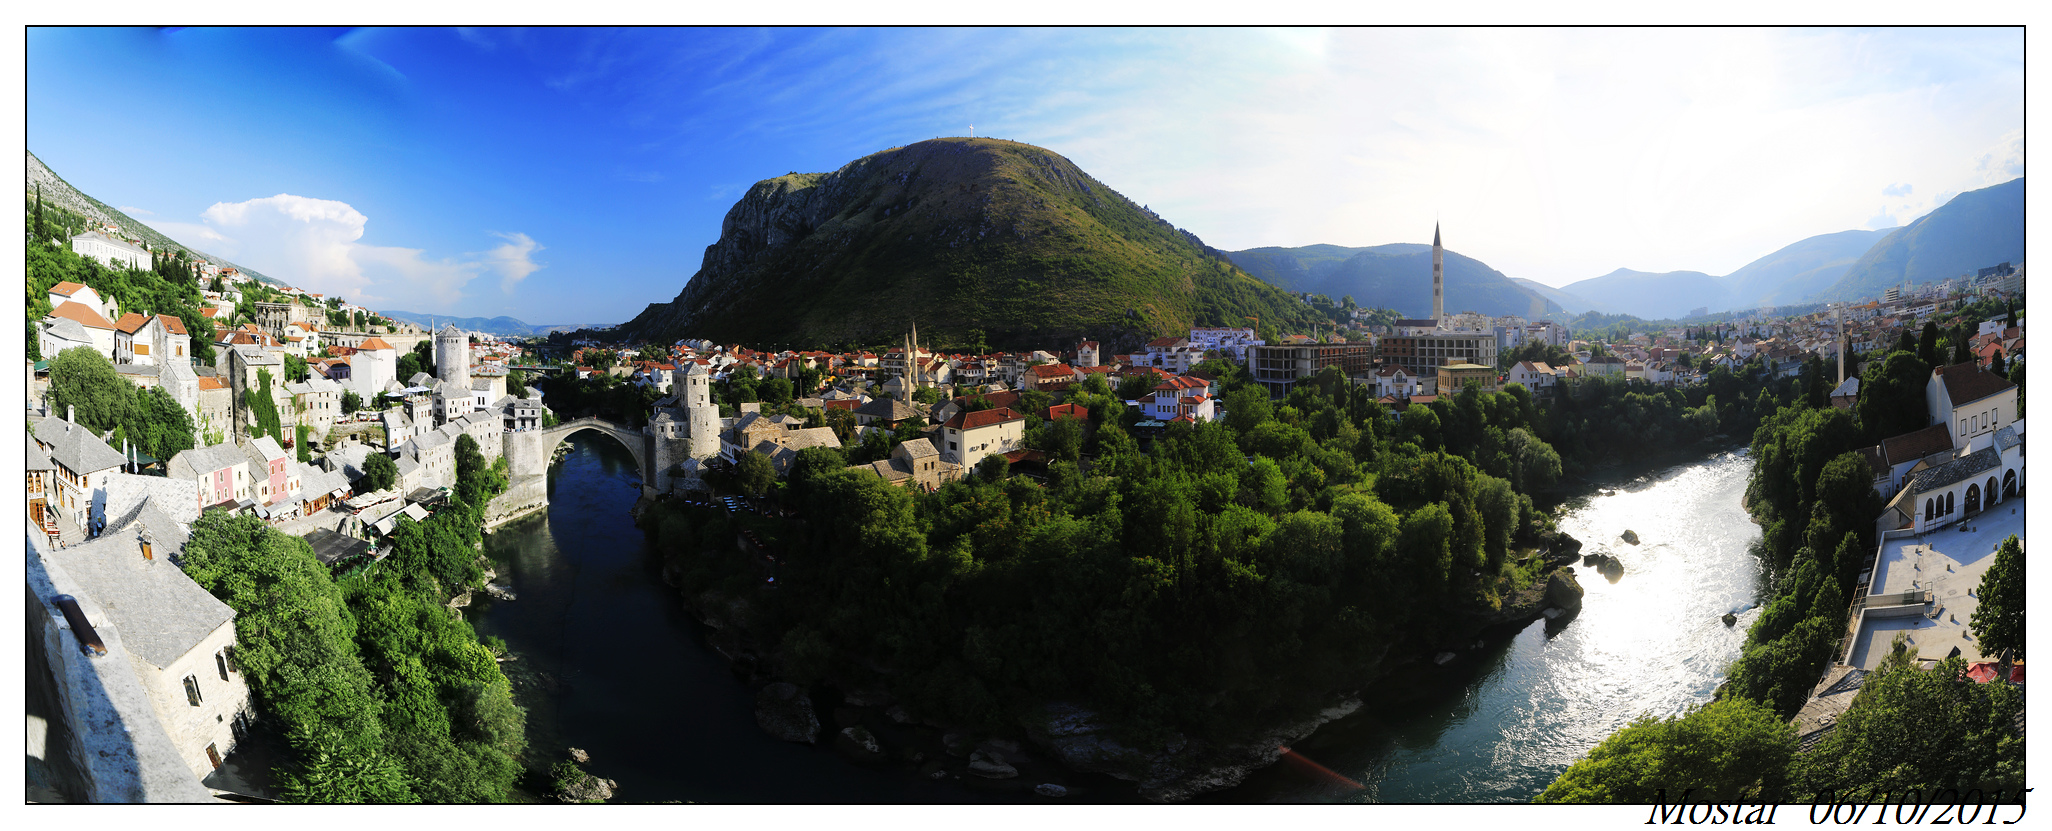 Mostar_全景2_小.jpg